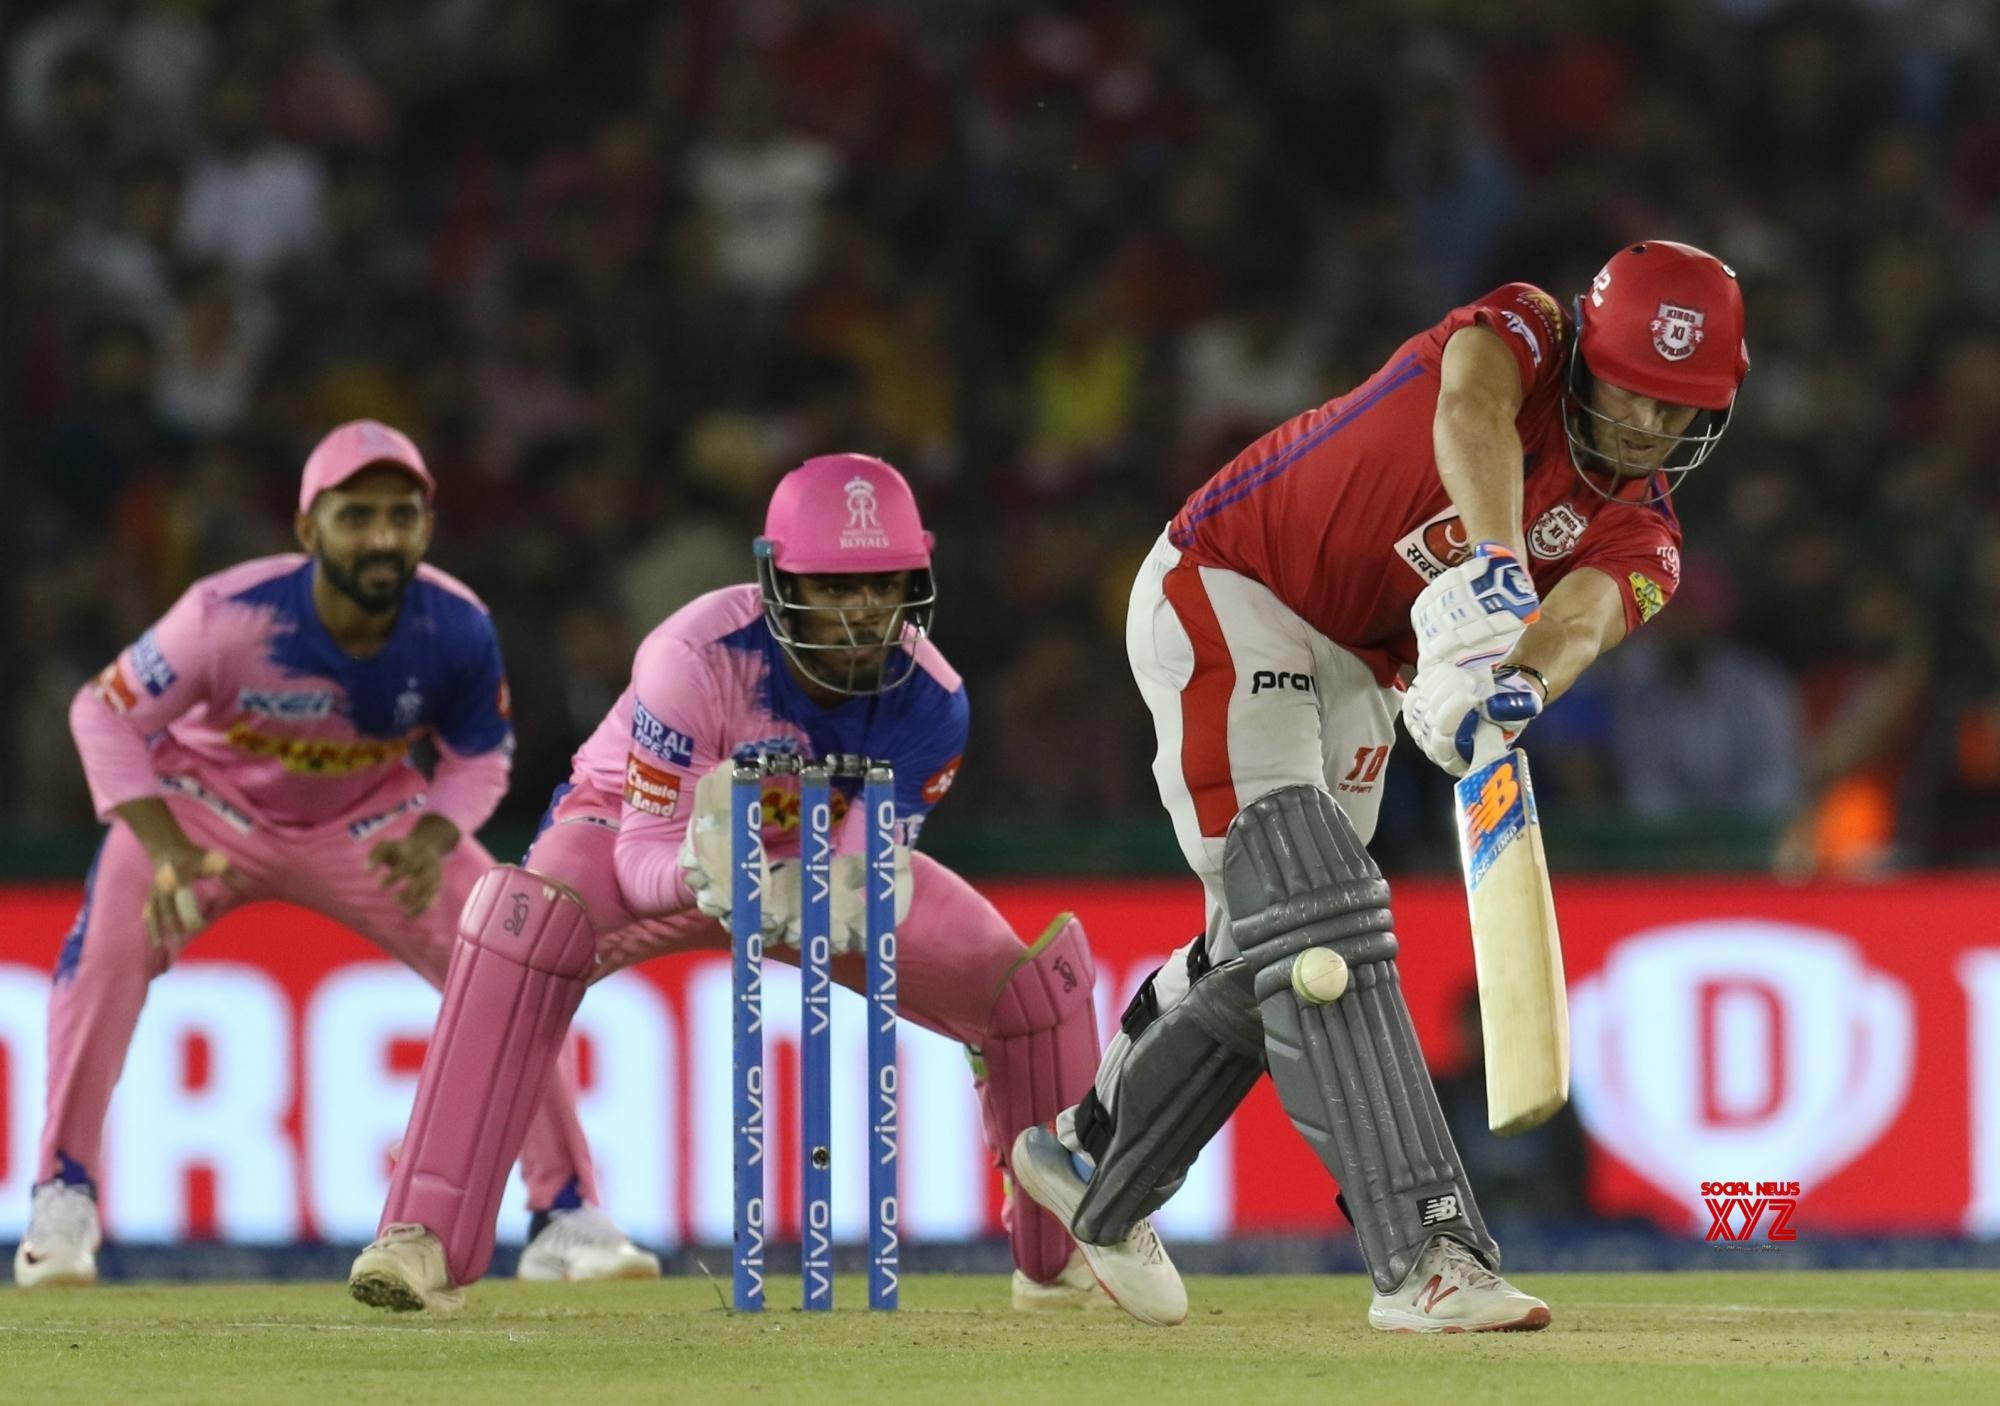 Mohali: IPL 2019 - Match 32 - Kings XI Punjab Vs Rajasthan Royals (Batch - 12) #Gallery